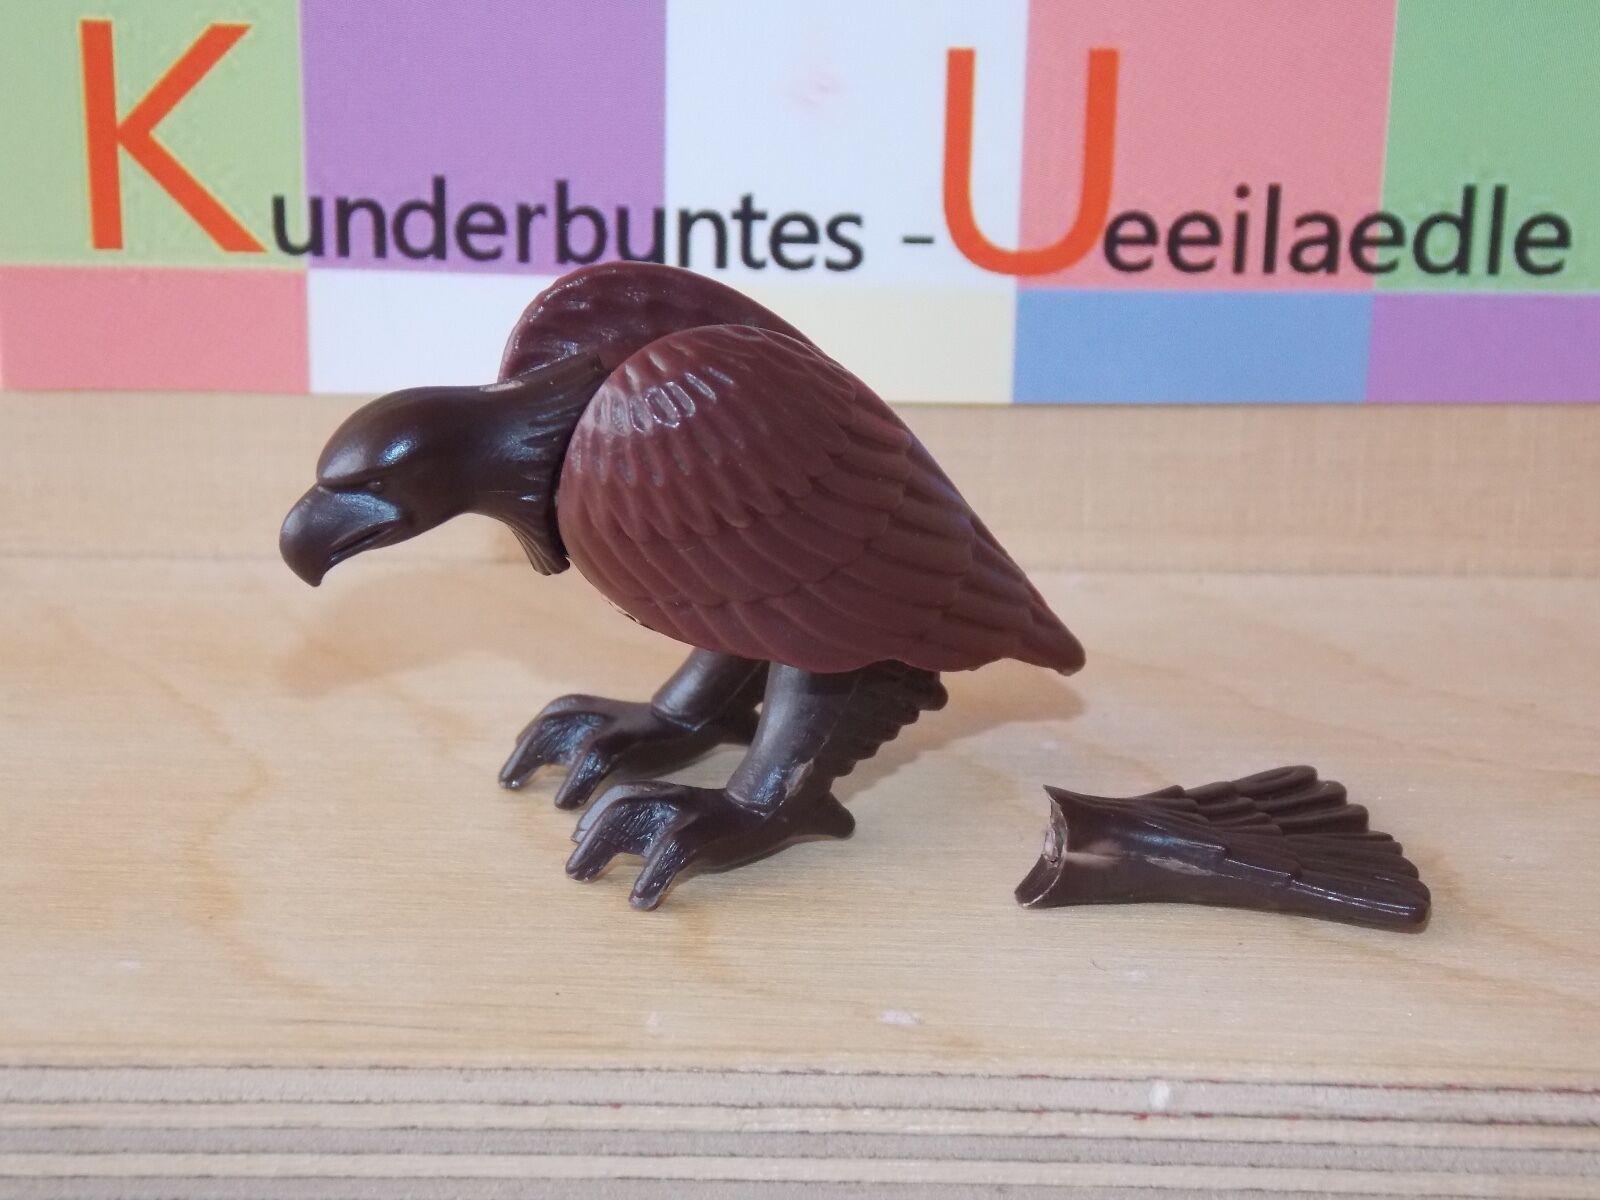 Tiere Nordamerikas  D 1991  Adler sitzend dunkelbraune Flügel